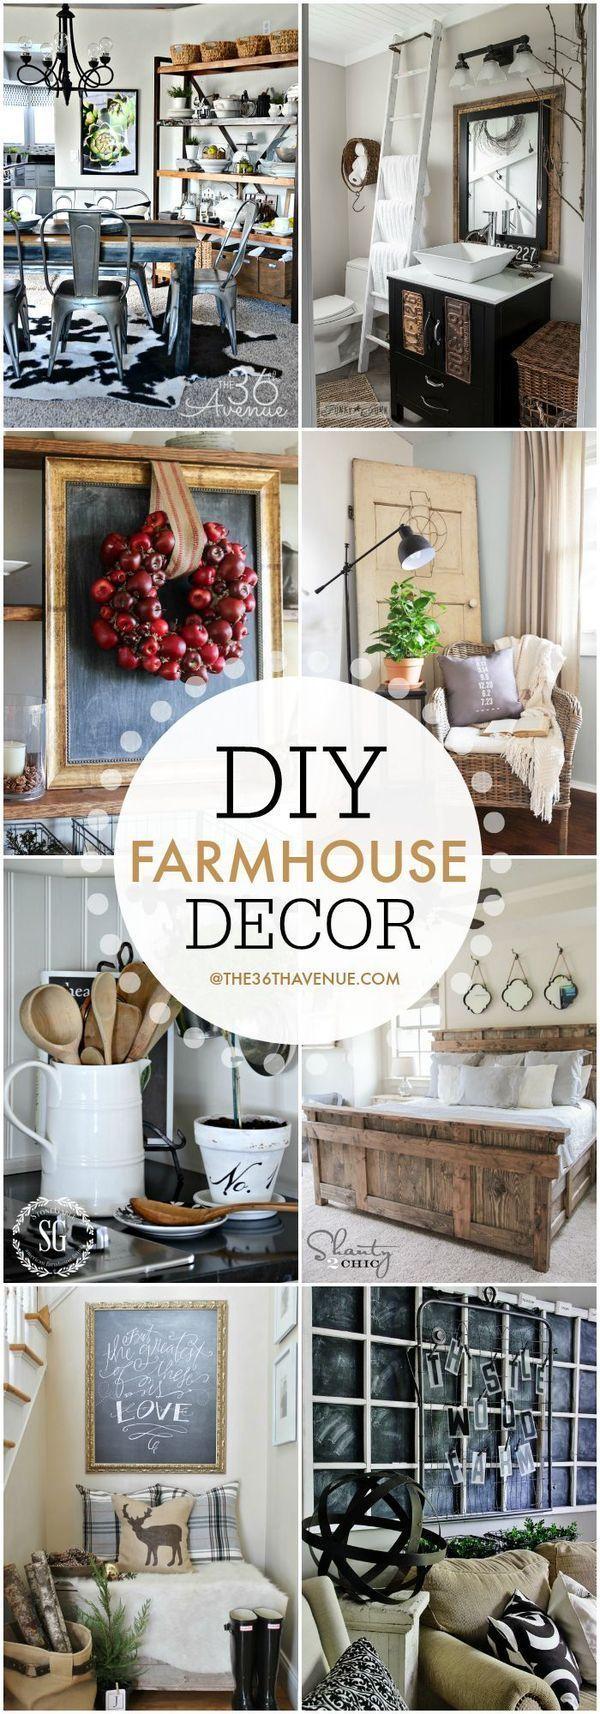 cool the 36th avenue farmhouse home decor ideas by http